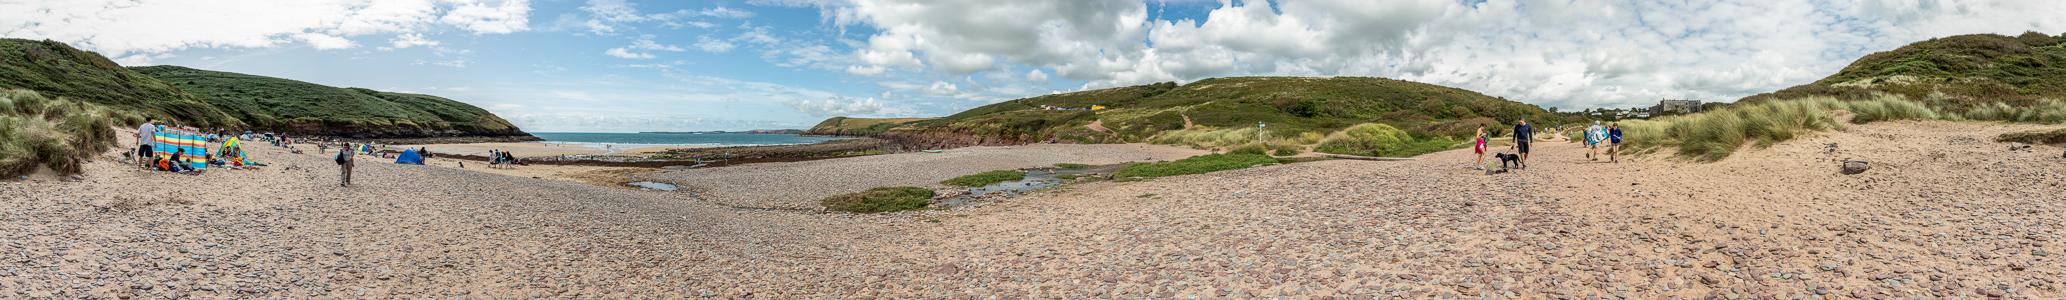 Manorbier Bay: Manorbier Beach